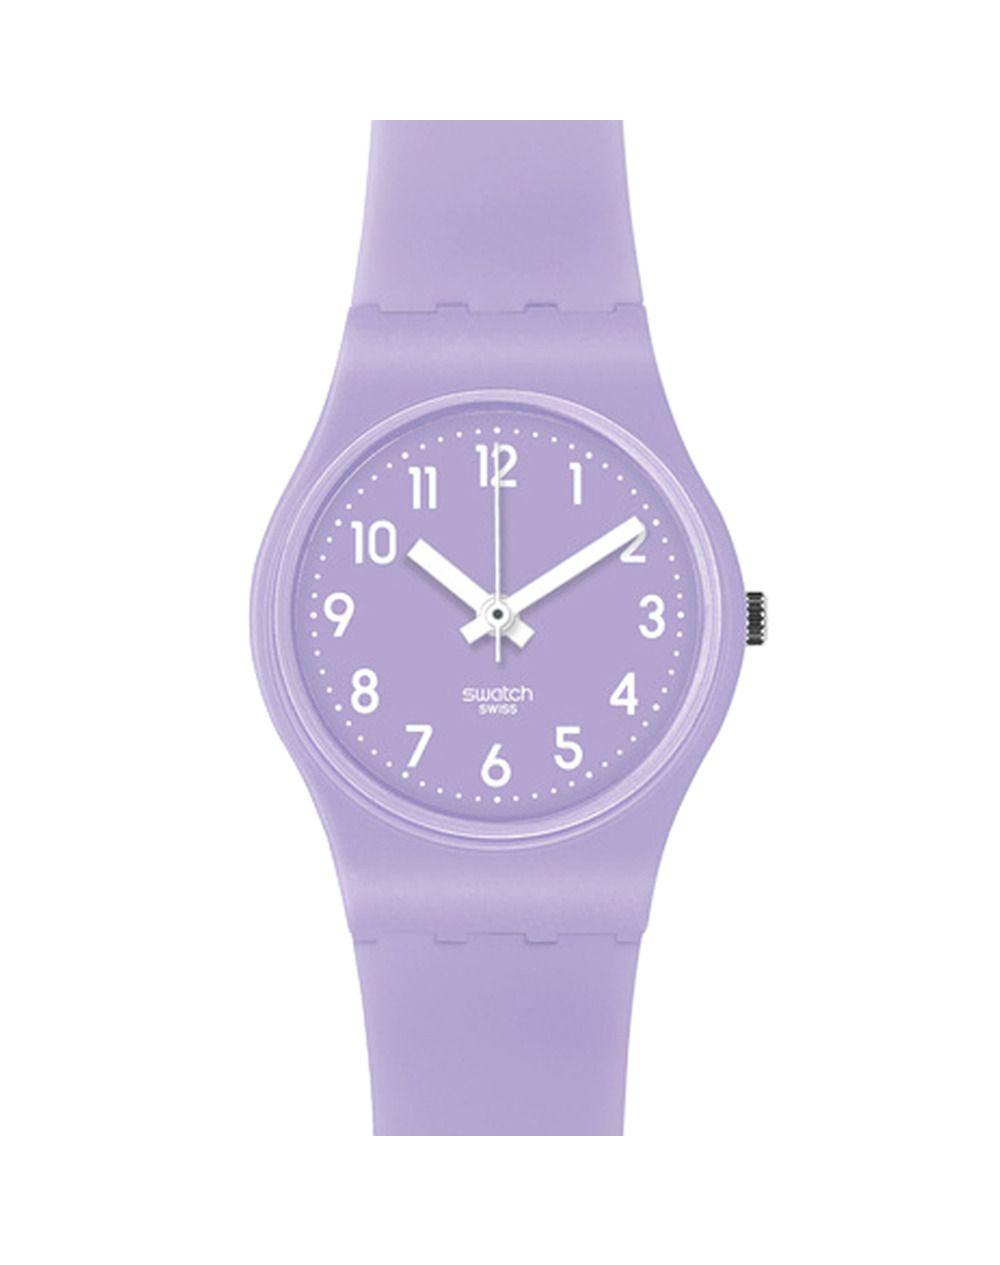 7193f9c68e07 Reloj de mujer Berry Sorbet Swatch - Mujer - Relojes - El Corte Inglés -  Moda